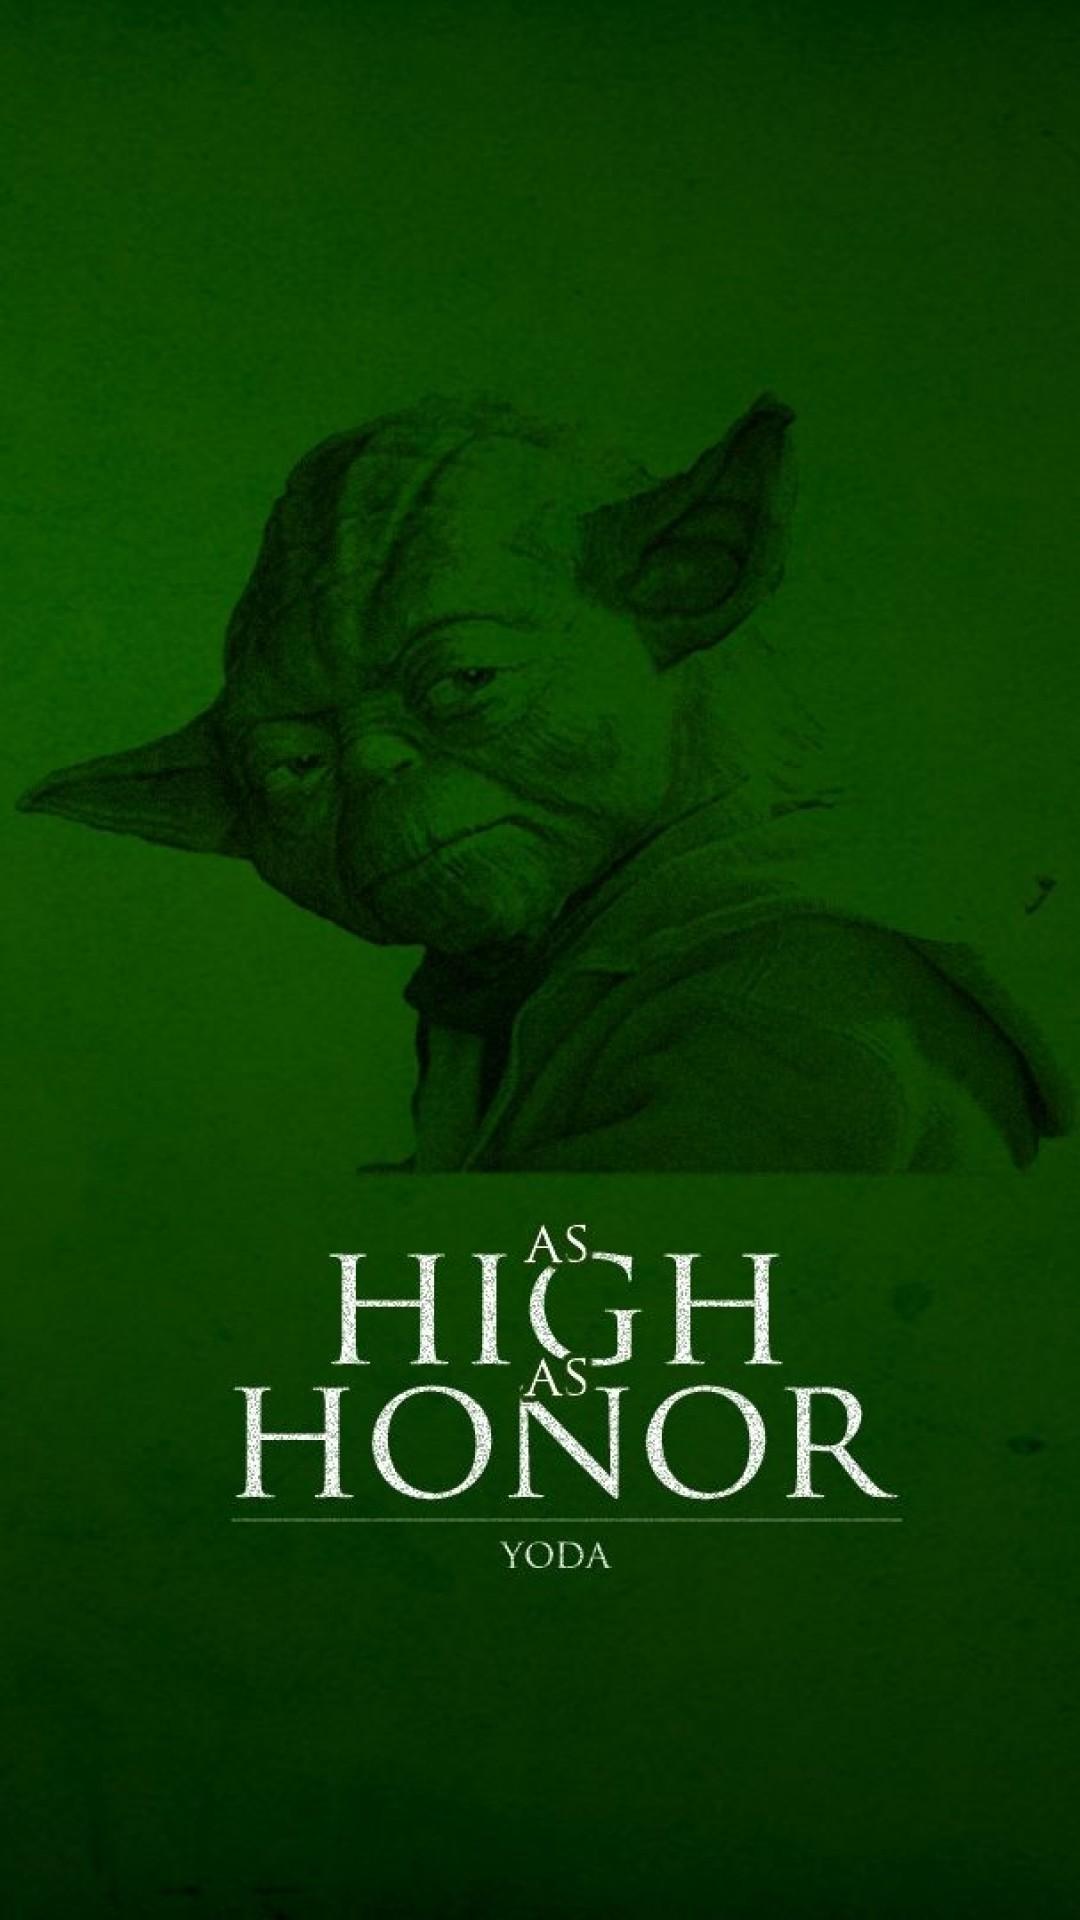 Yoda Wallpaper Star Wars photos of Epic Star Wars Iphone Wallpaper 1080x1920